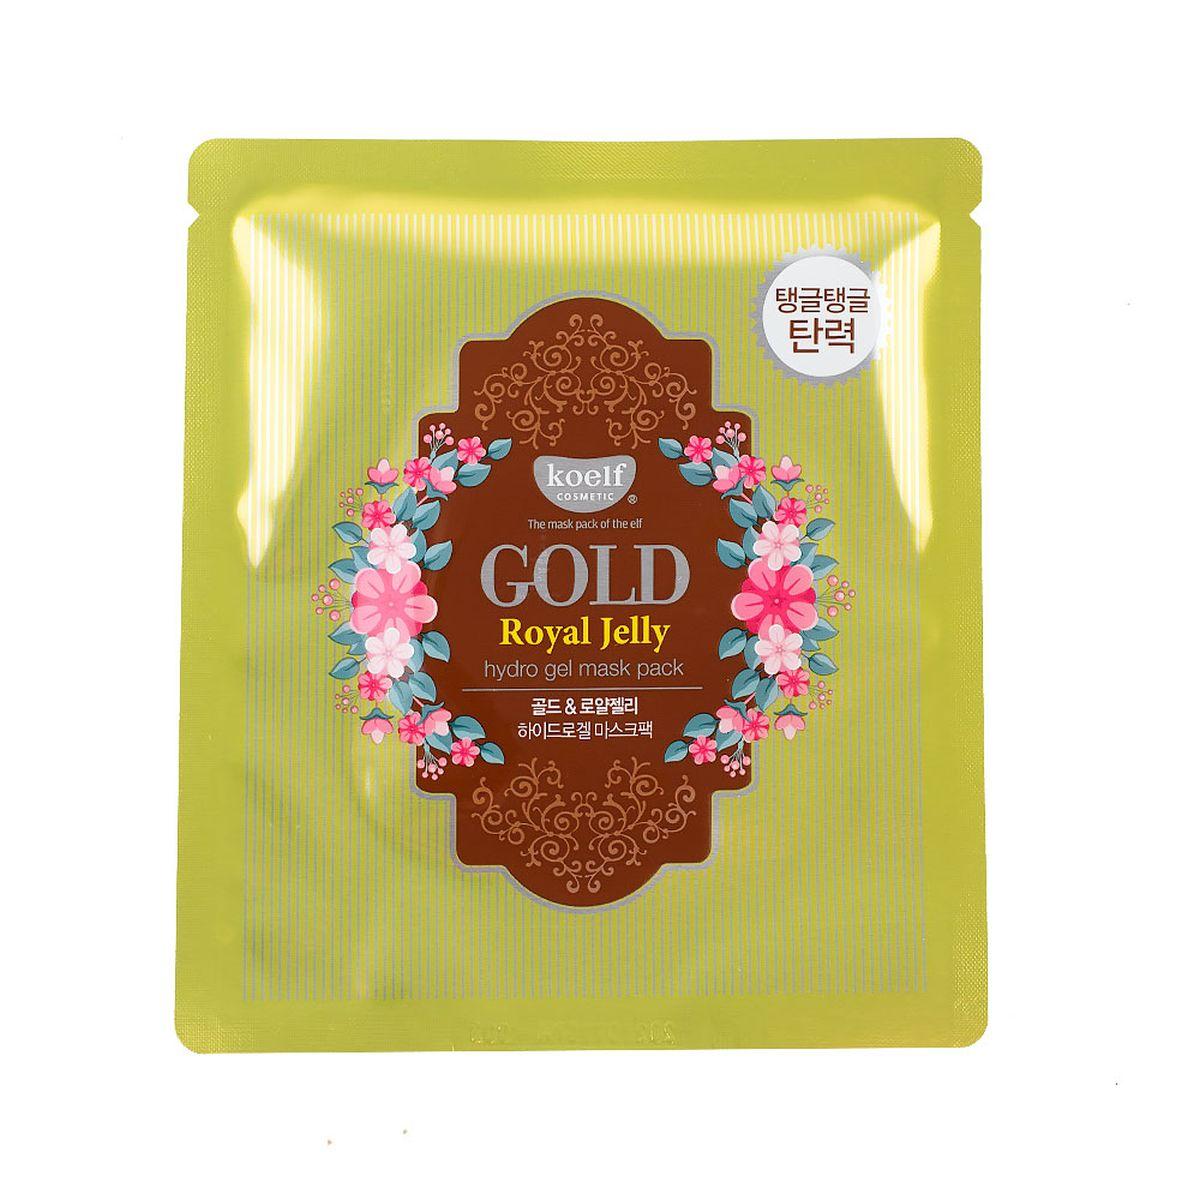 Гидрогелевая маска для лица с золотом Koelf Gold & Royal Jelly Mask - 30 мл